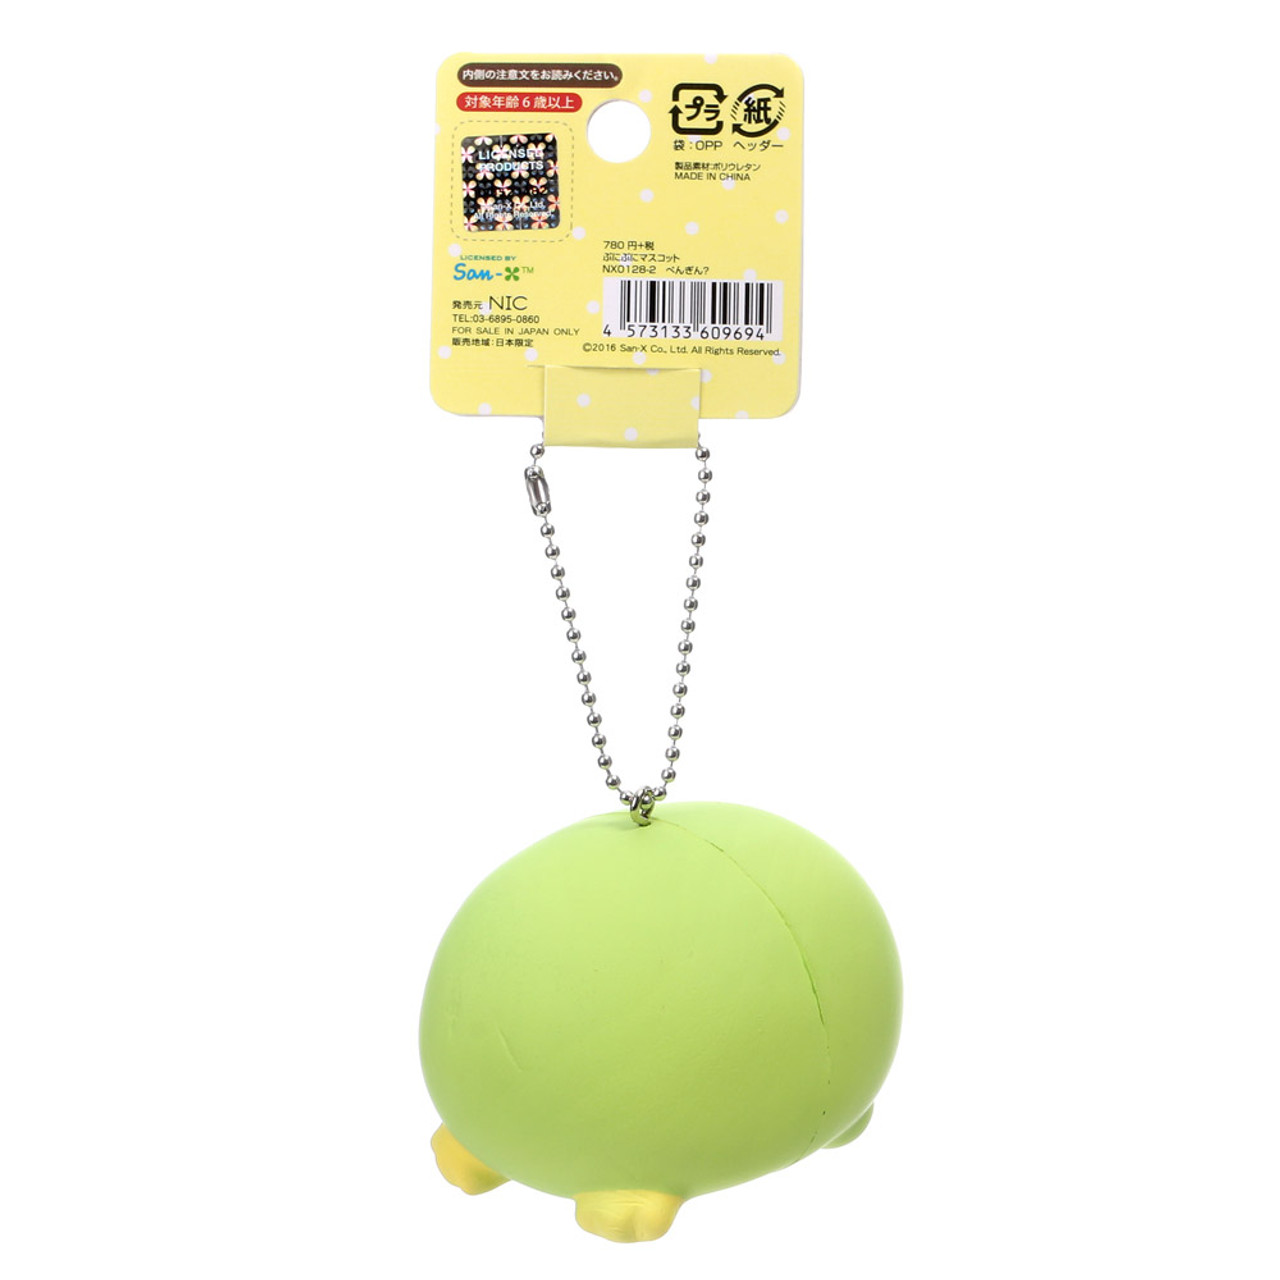 San-x Sumikko Gurashi Tsum Tsum Style Penguin Squishy Toy Charm ( Tag Back View )